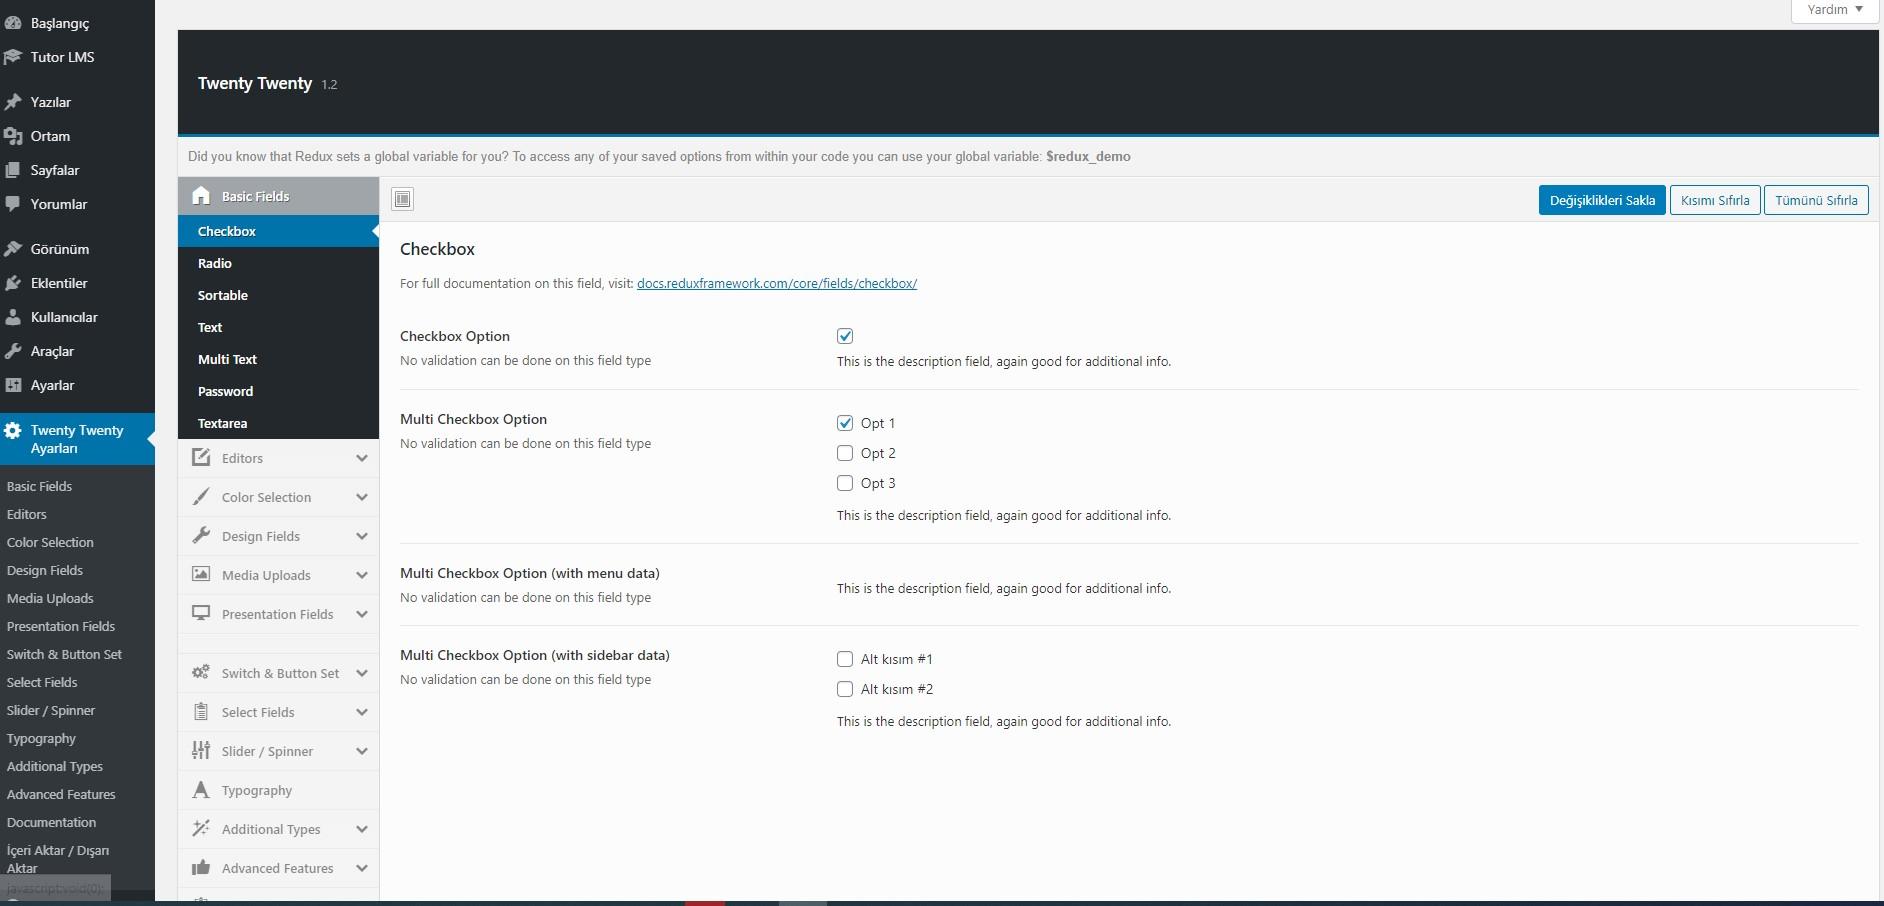 Wordpress tema ayarları redux framework